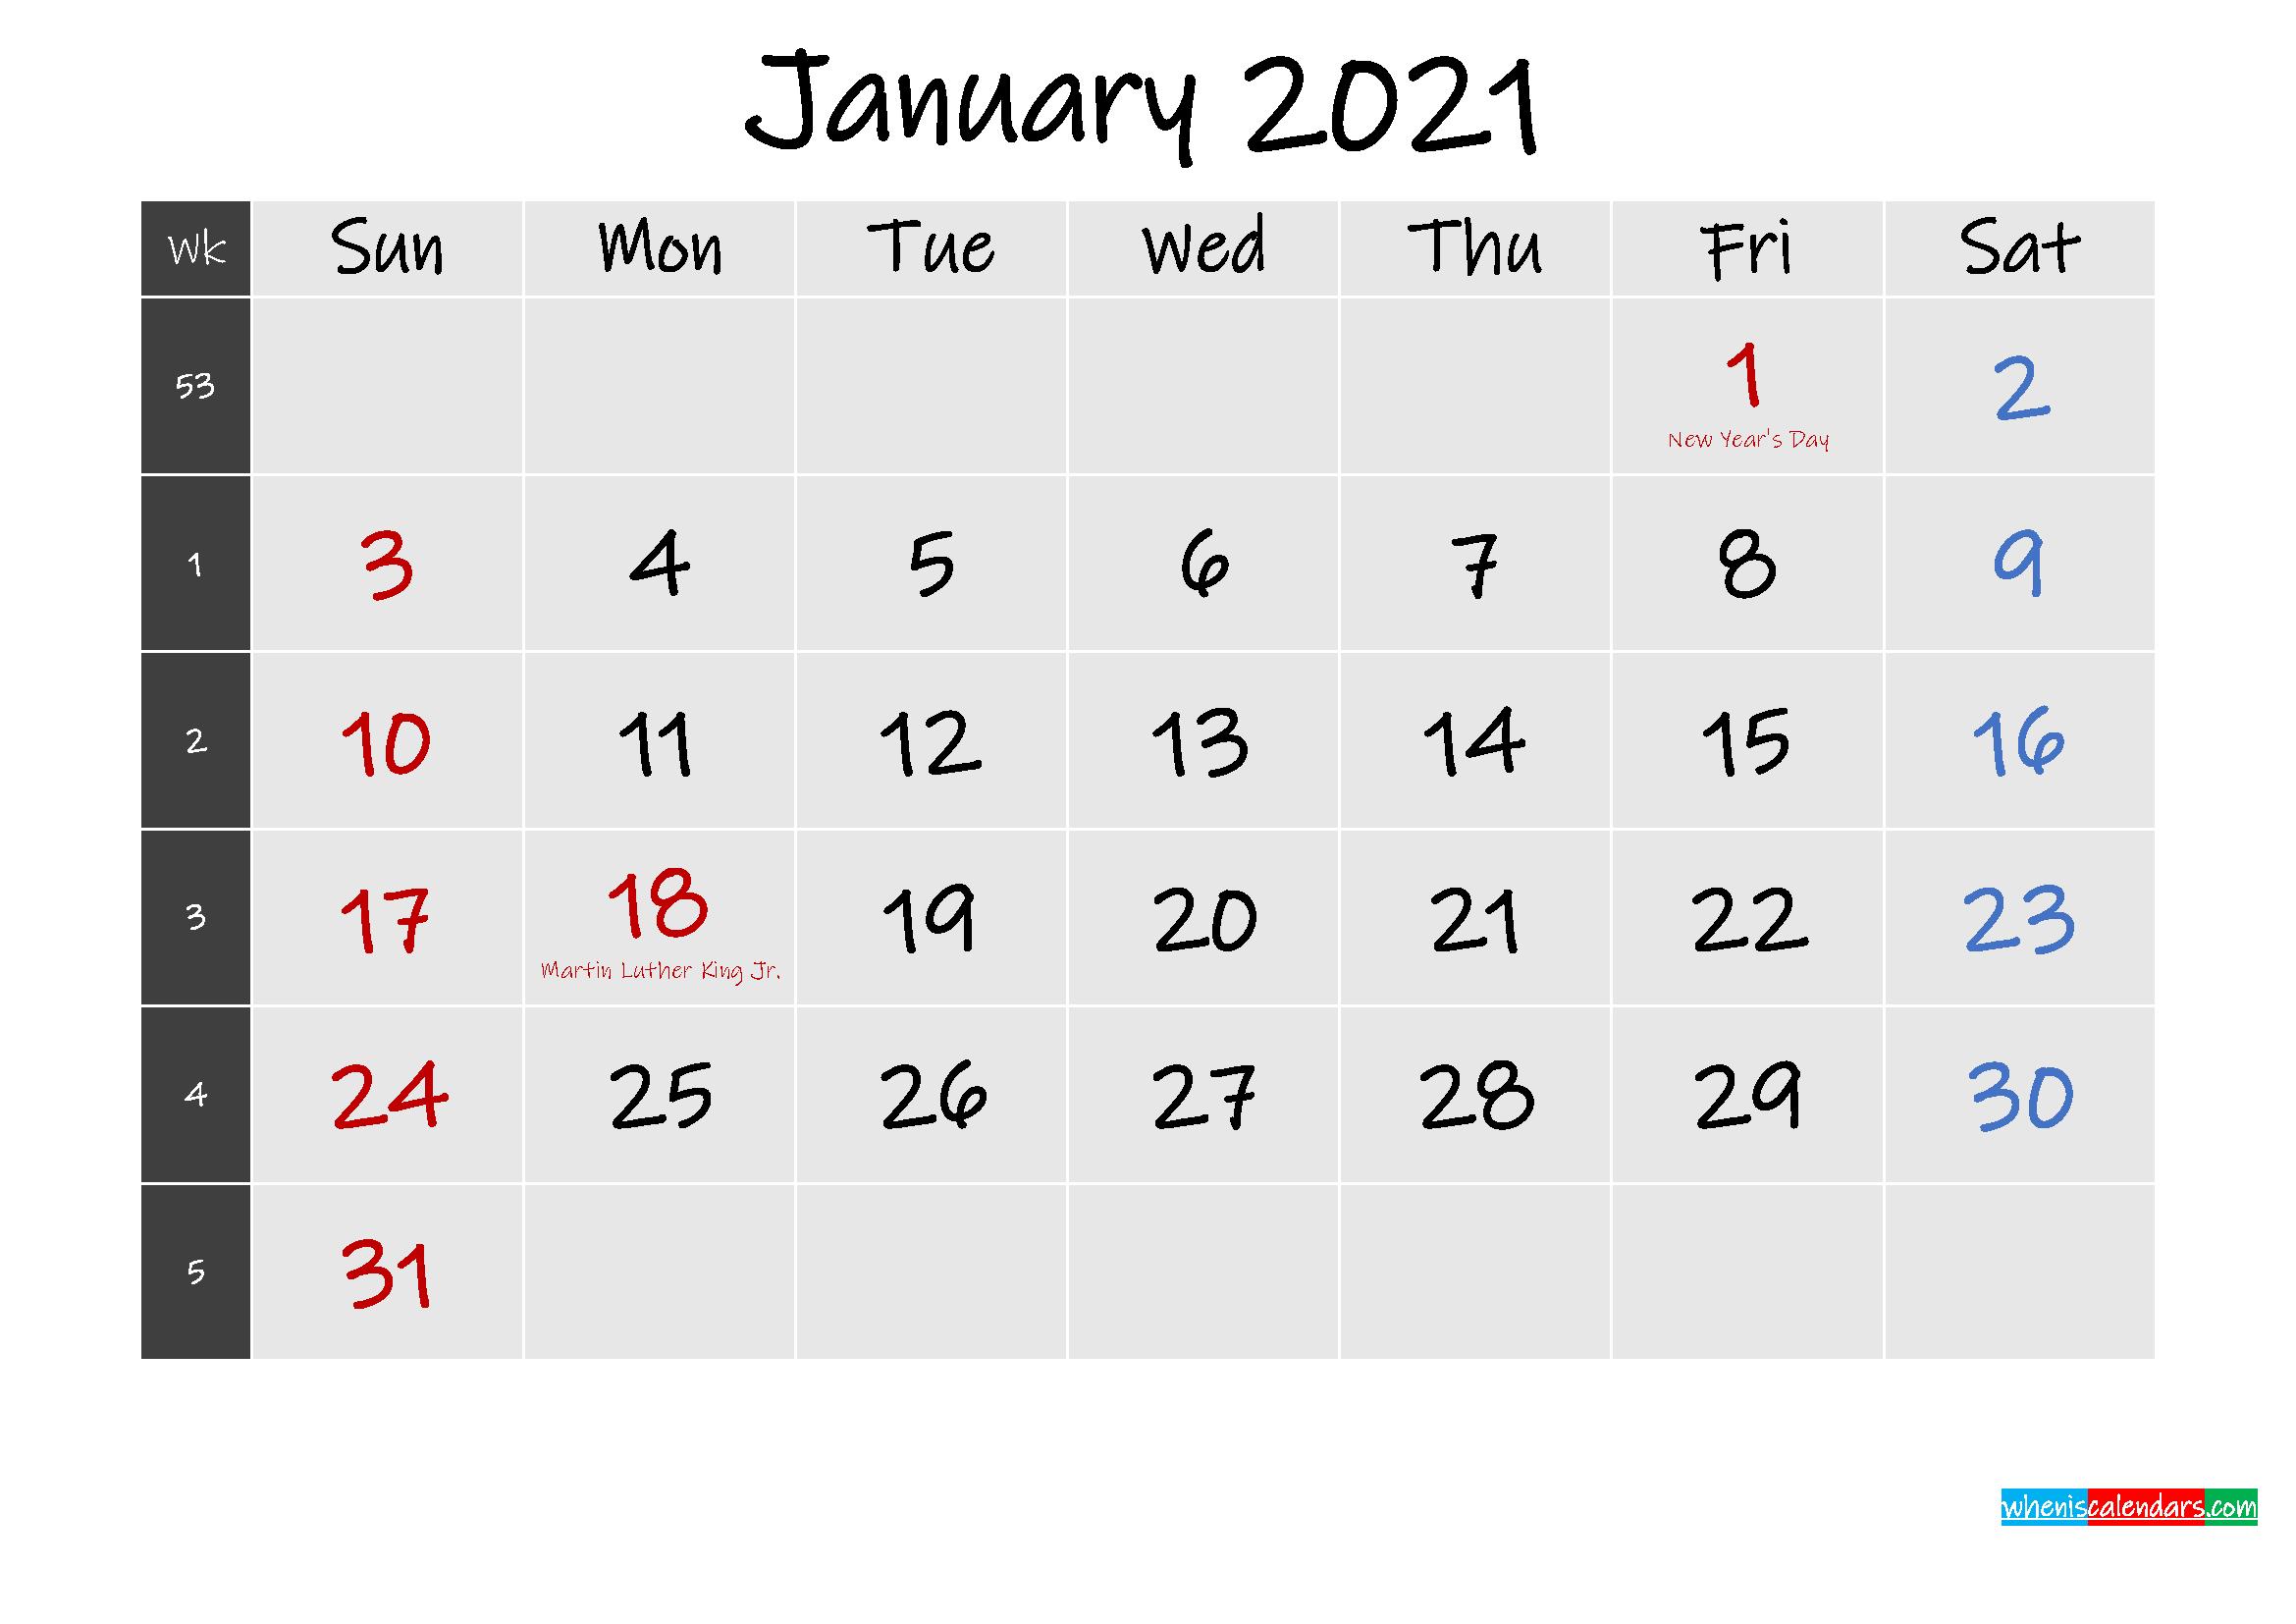 2021 Monthly Calendar Printable Word - Free Printable 8 Week Calendar | Ten Free Printable